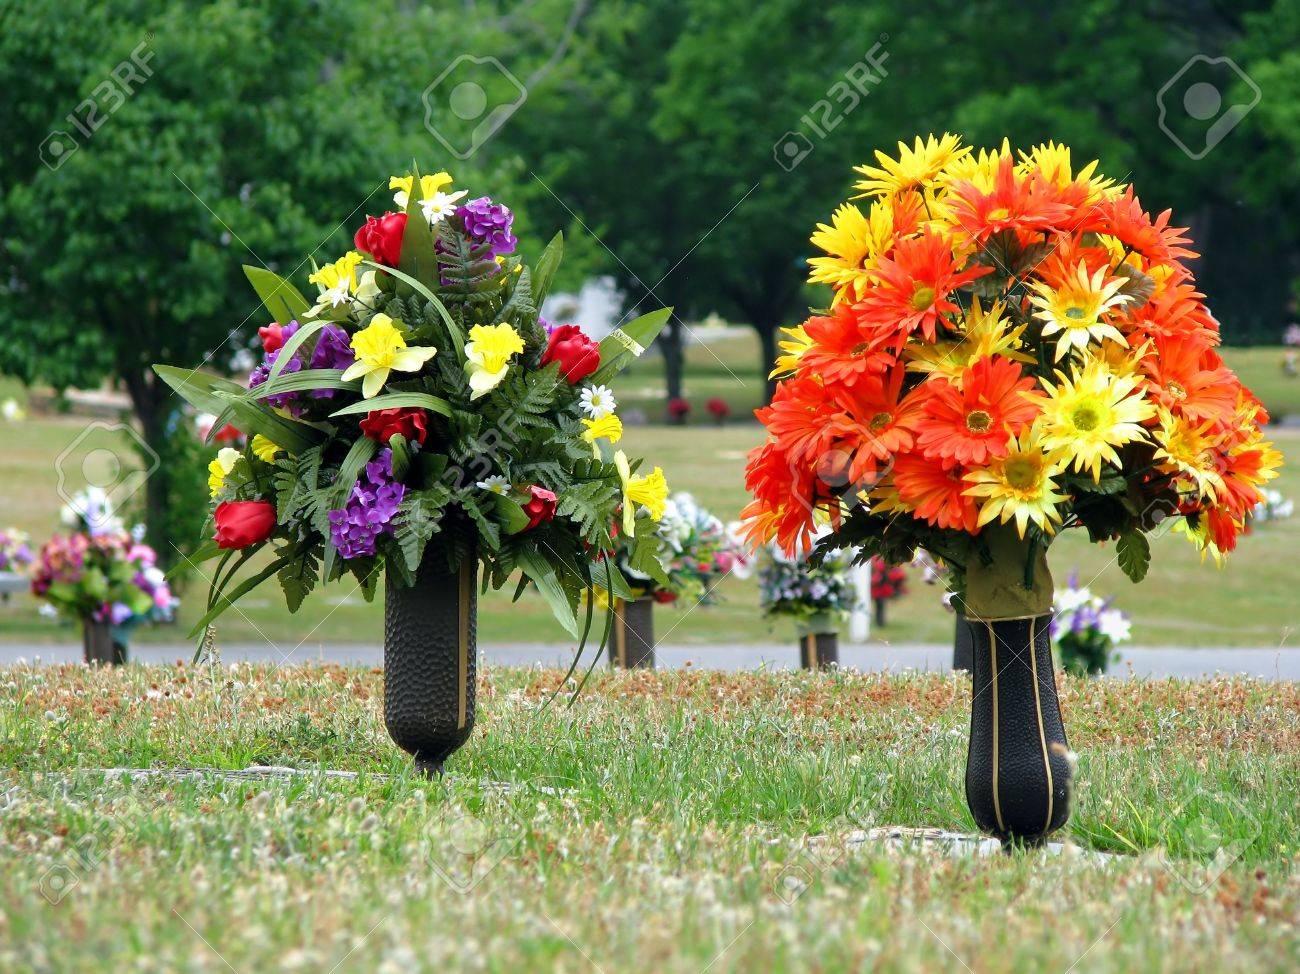 colorful silk flower vases in summer cemetery Stock Photo - 4849883 & Colorful Silk Flower Vases In Summer Cemetery Stock Photo Picture ...